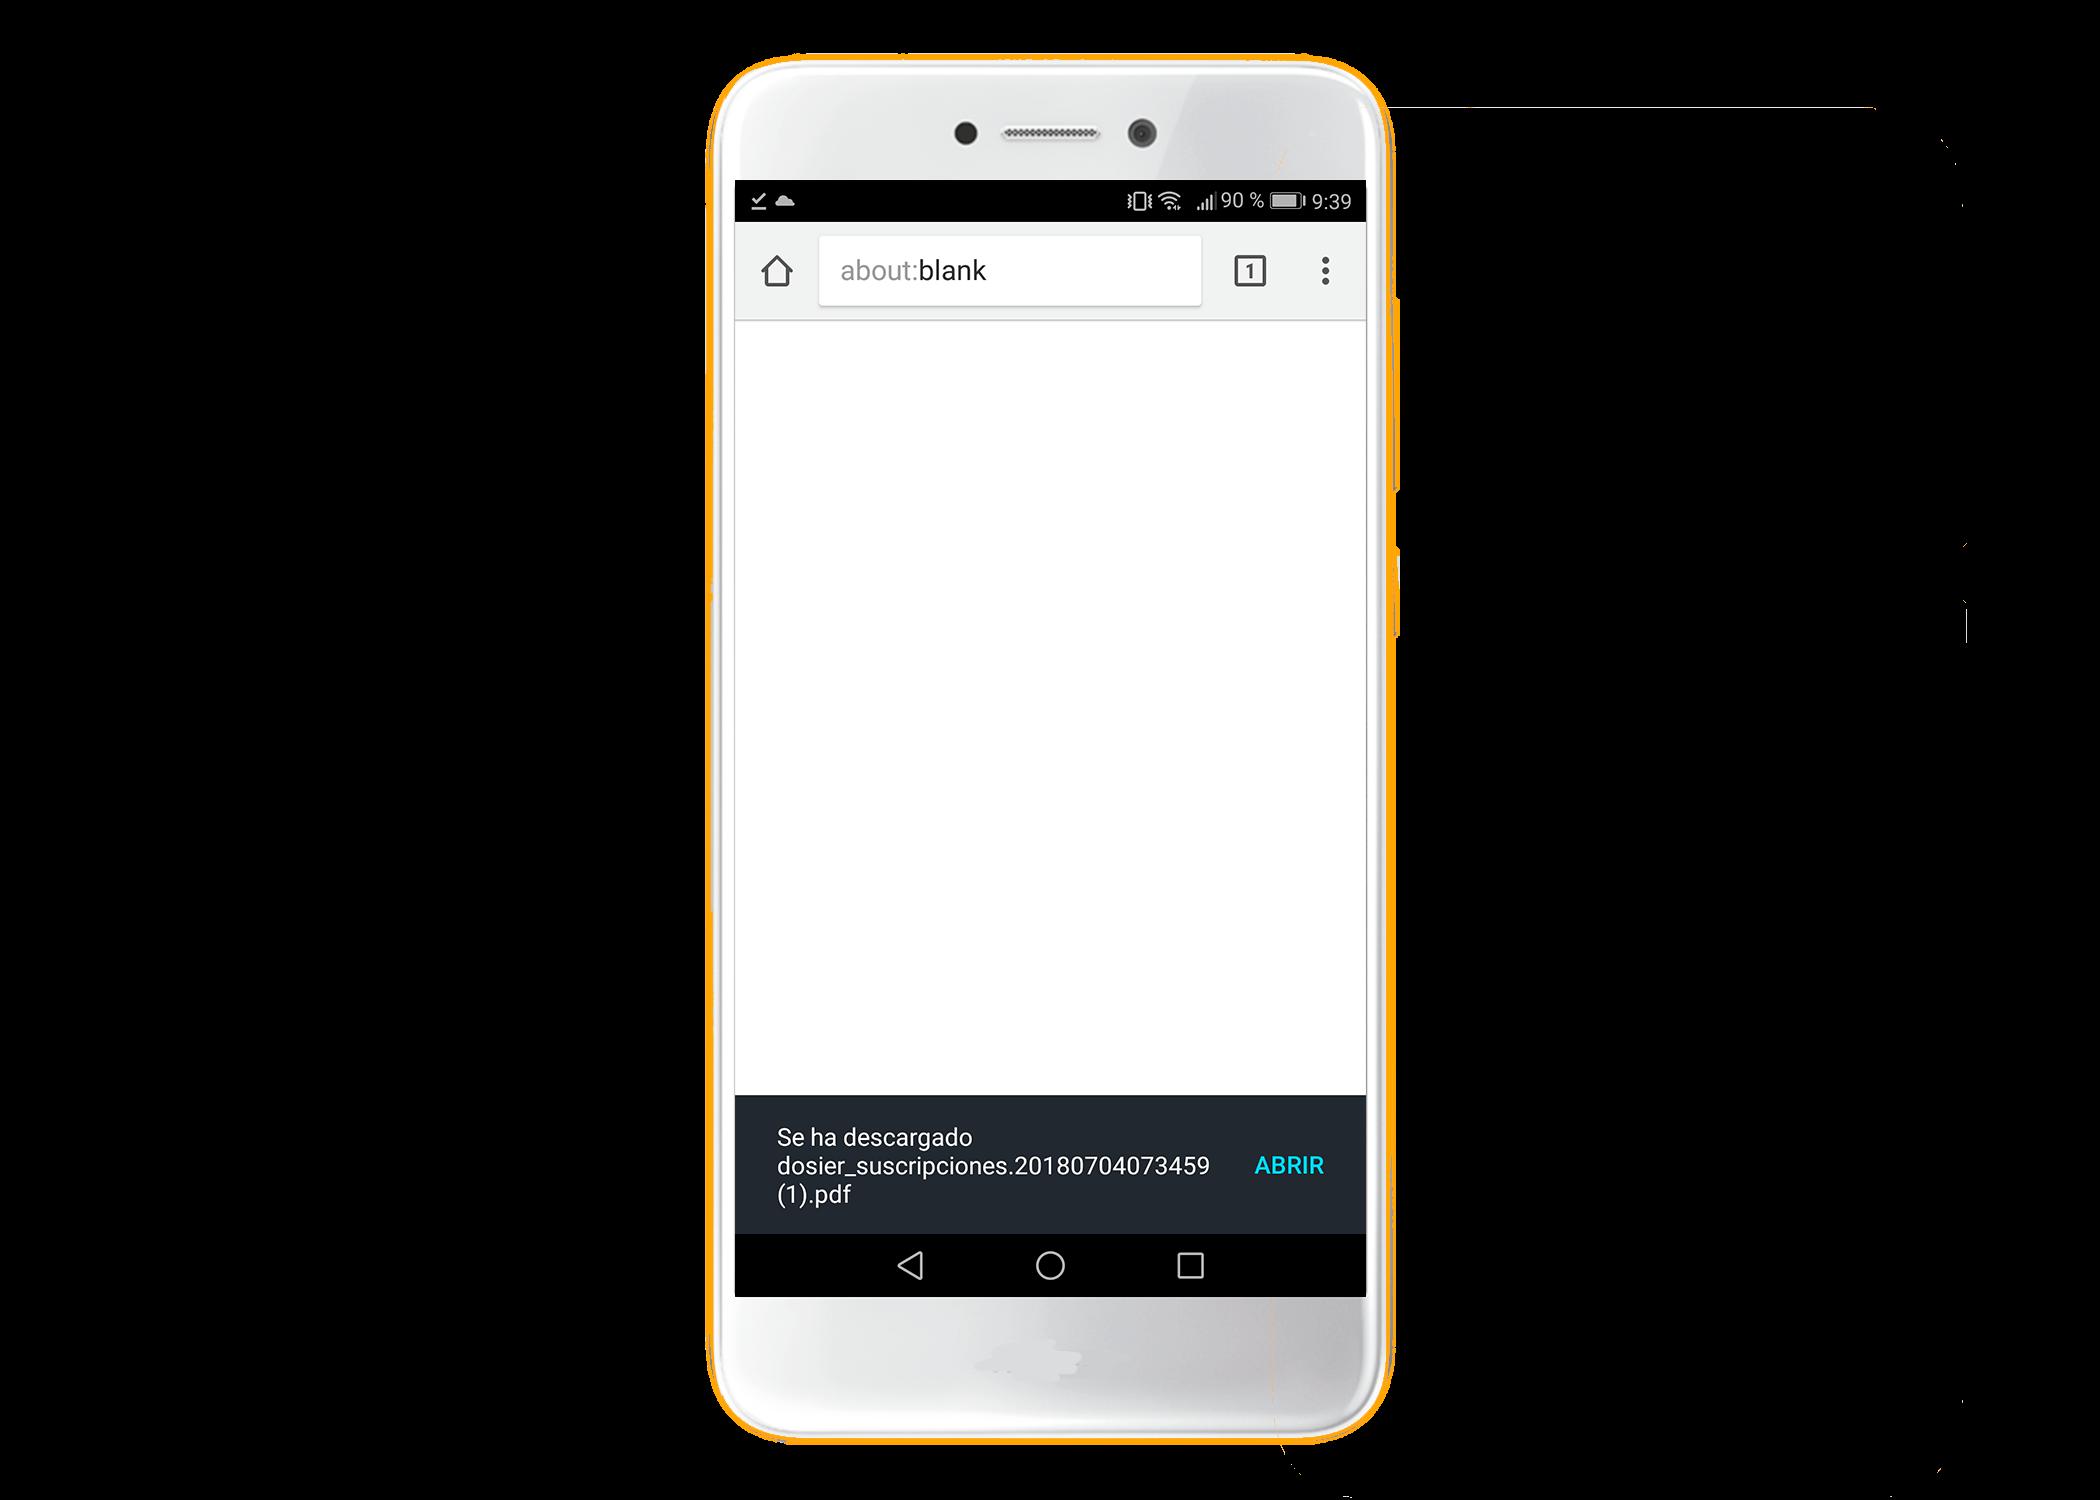 Abrir PDF en móvil iOS o Android. Abrir o enviar un PDF con TokApp